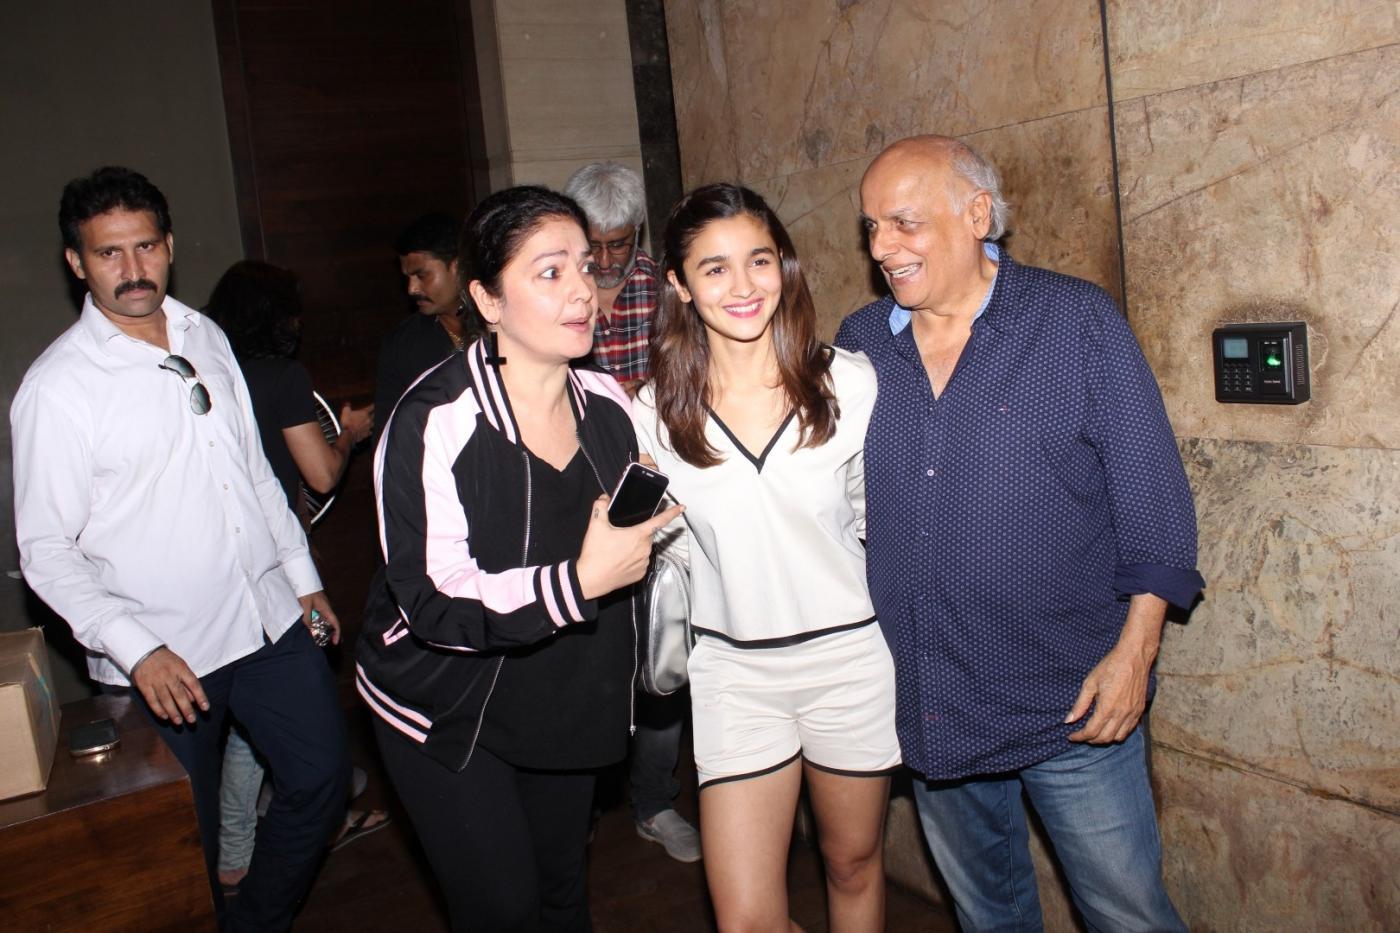 Mumbai: Filmmaker Mahesh Bhatt with his daughters and actors Pooja Bhatt and Alia Bhatt during the special screening of film Udta Punjab in Mumbai, on June 16, 2016. (Photo: IANS) by .